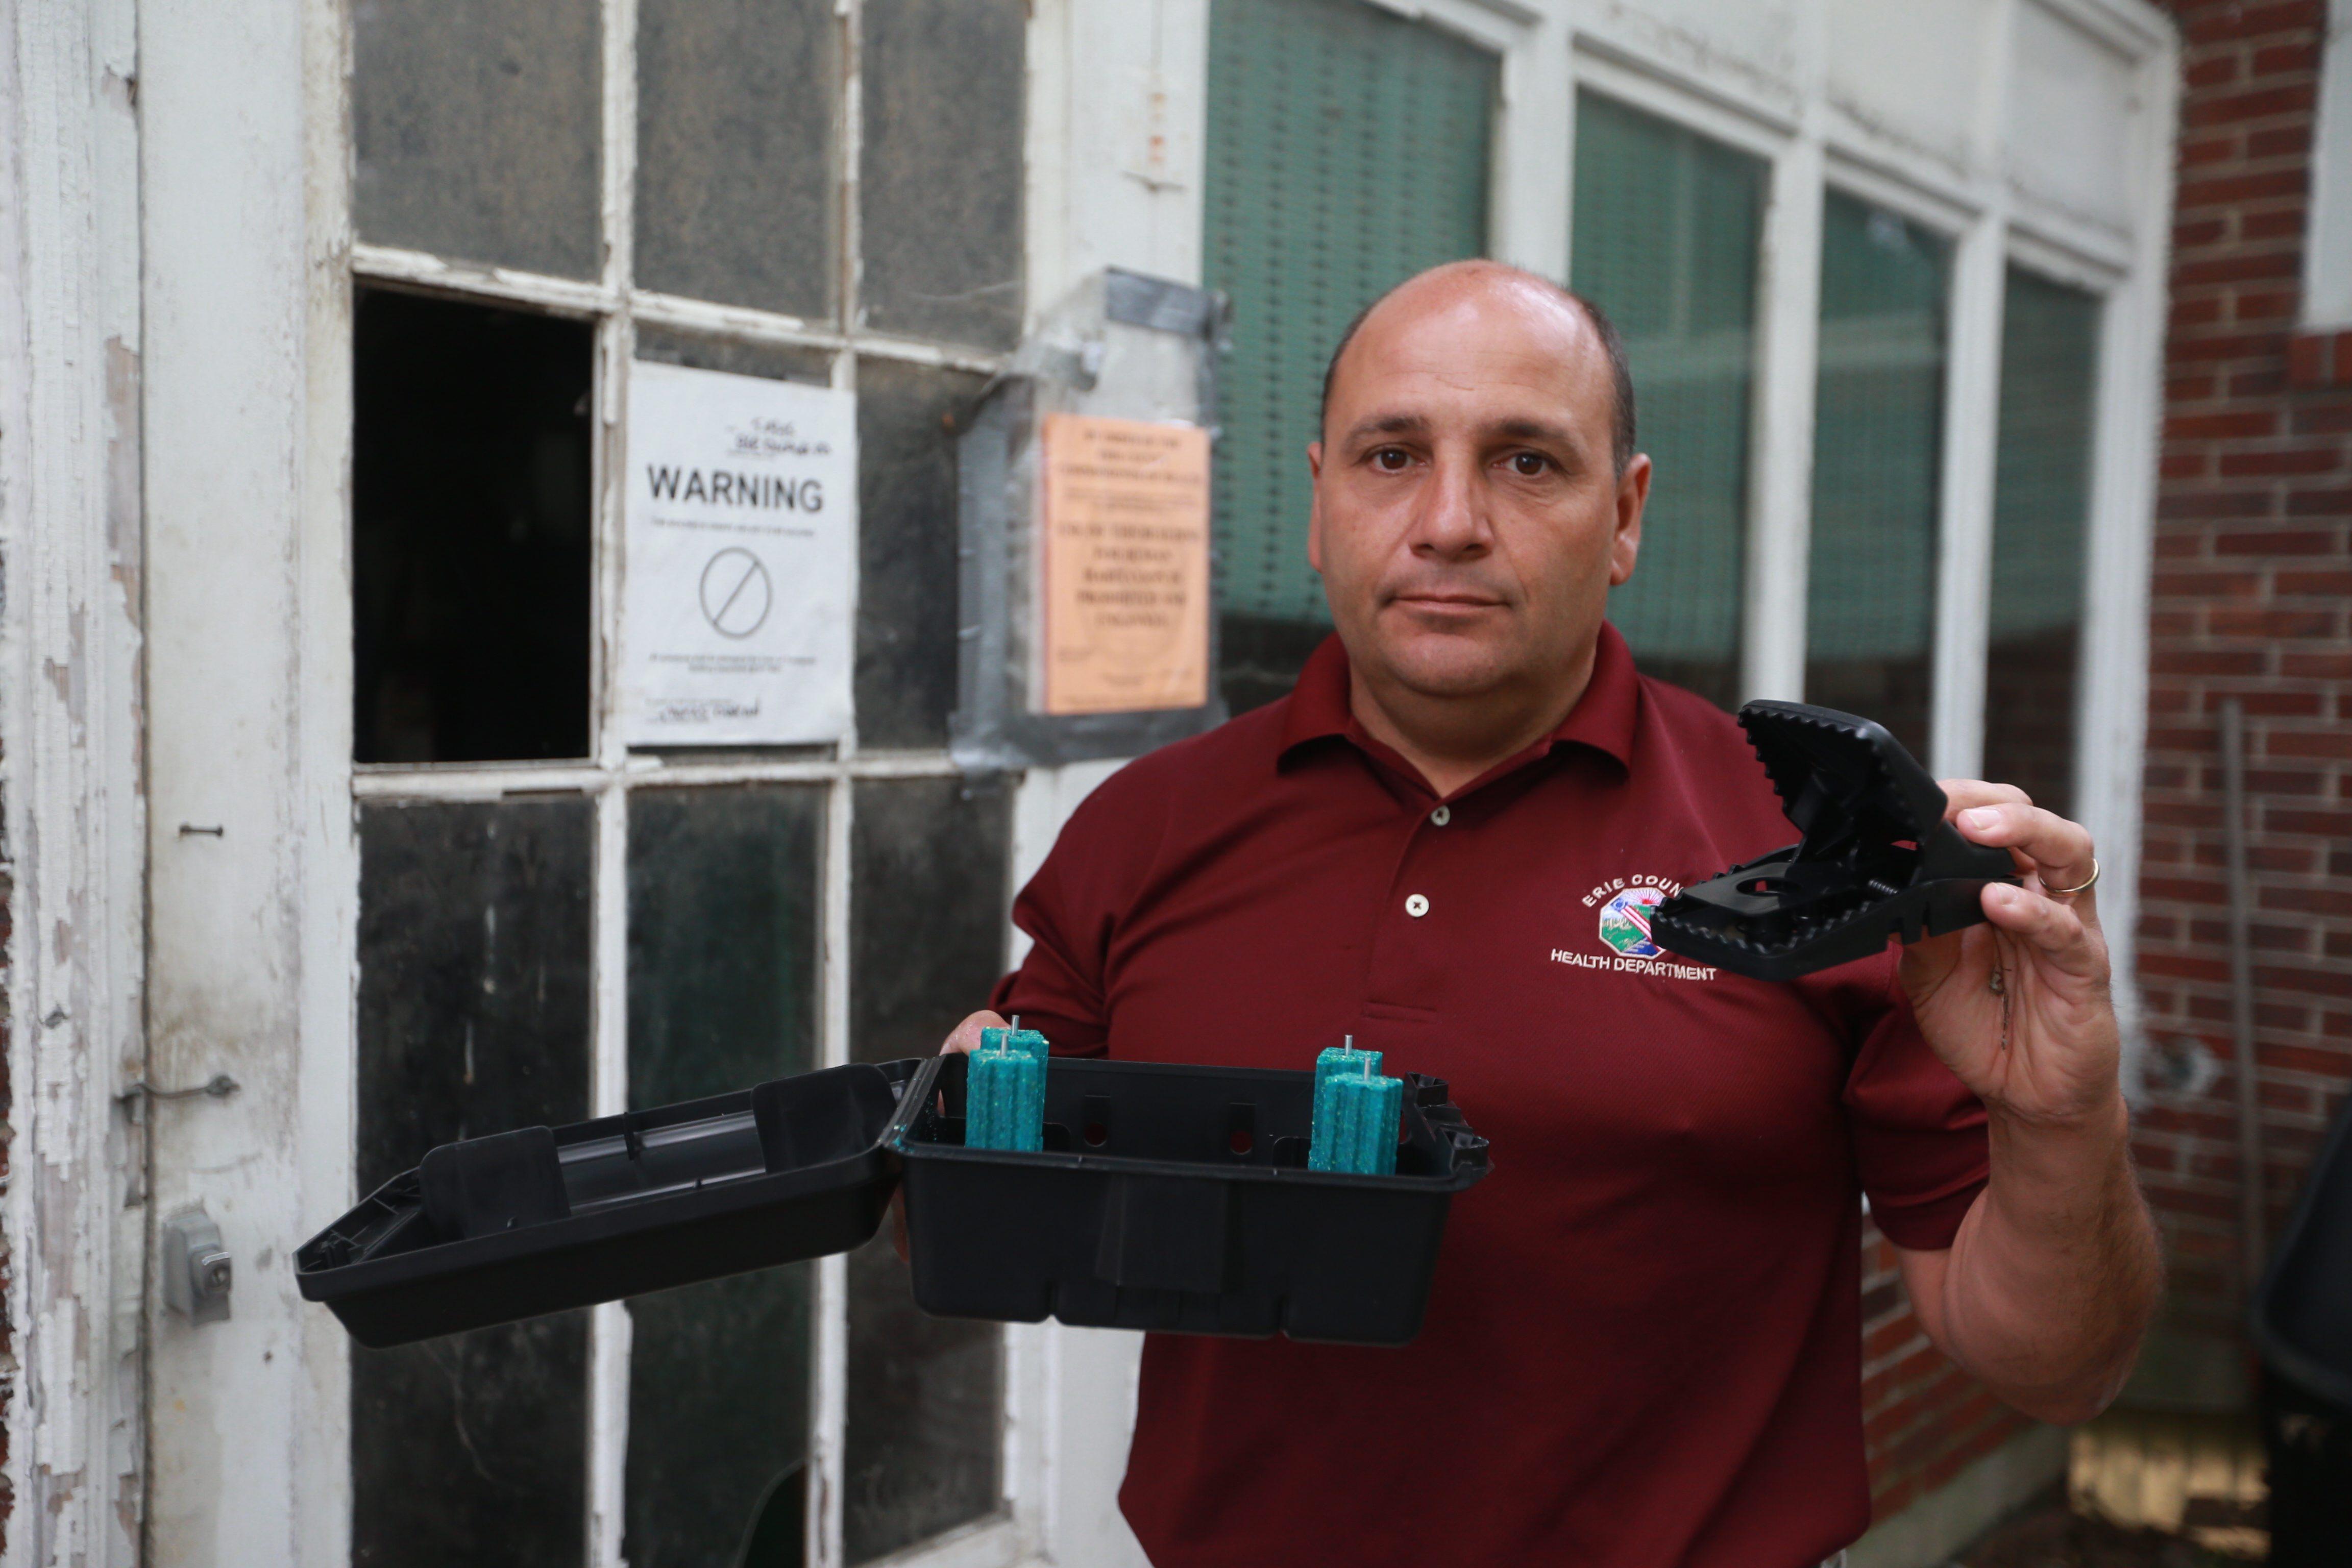 Peter Tripi, a sanitarian for the Erie County Health Department, says one unkept bird feeder can ruin a neighborhood. (John Hickey/Buffalo News file photo)